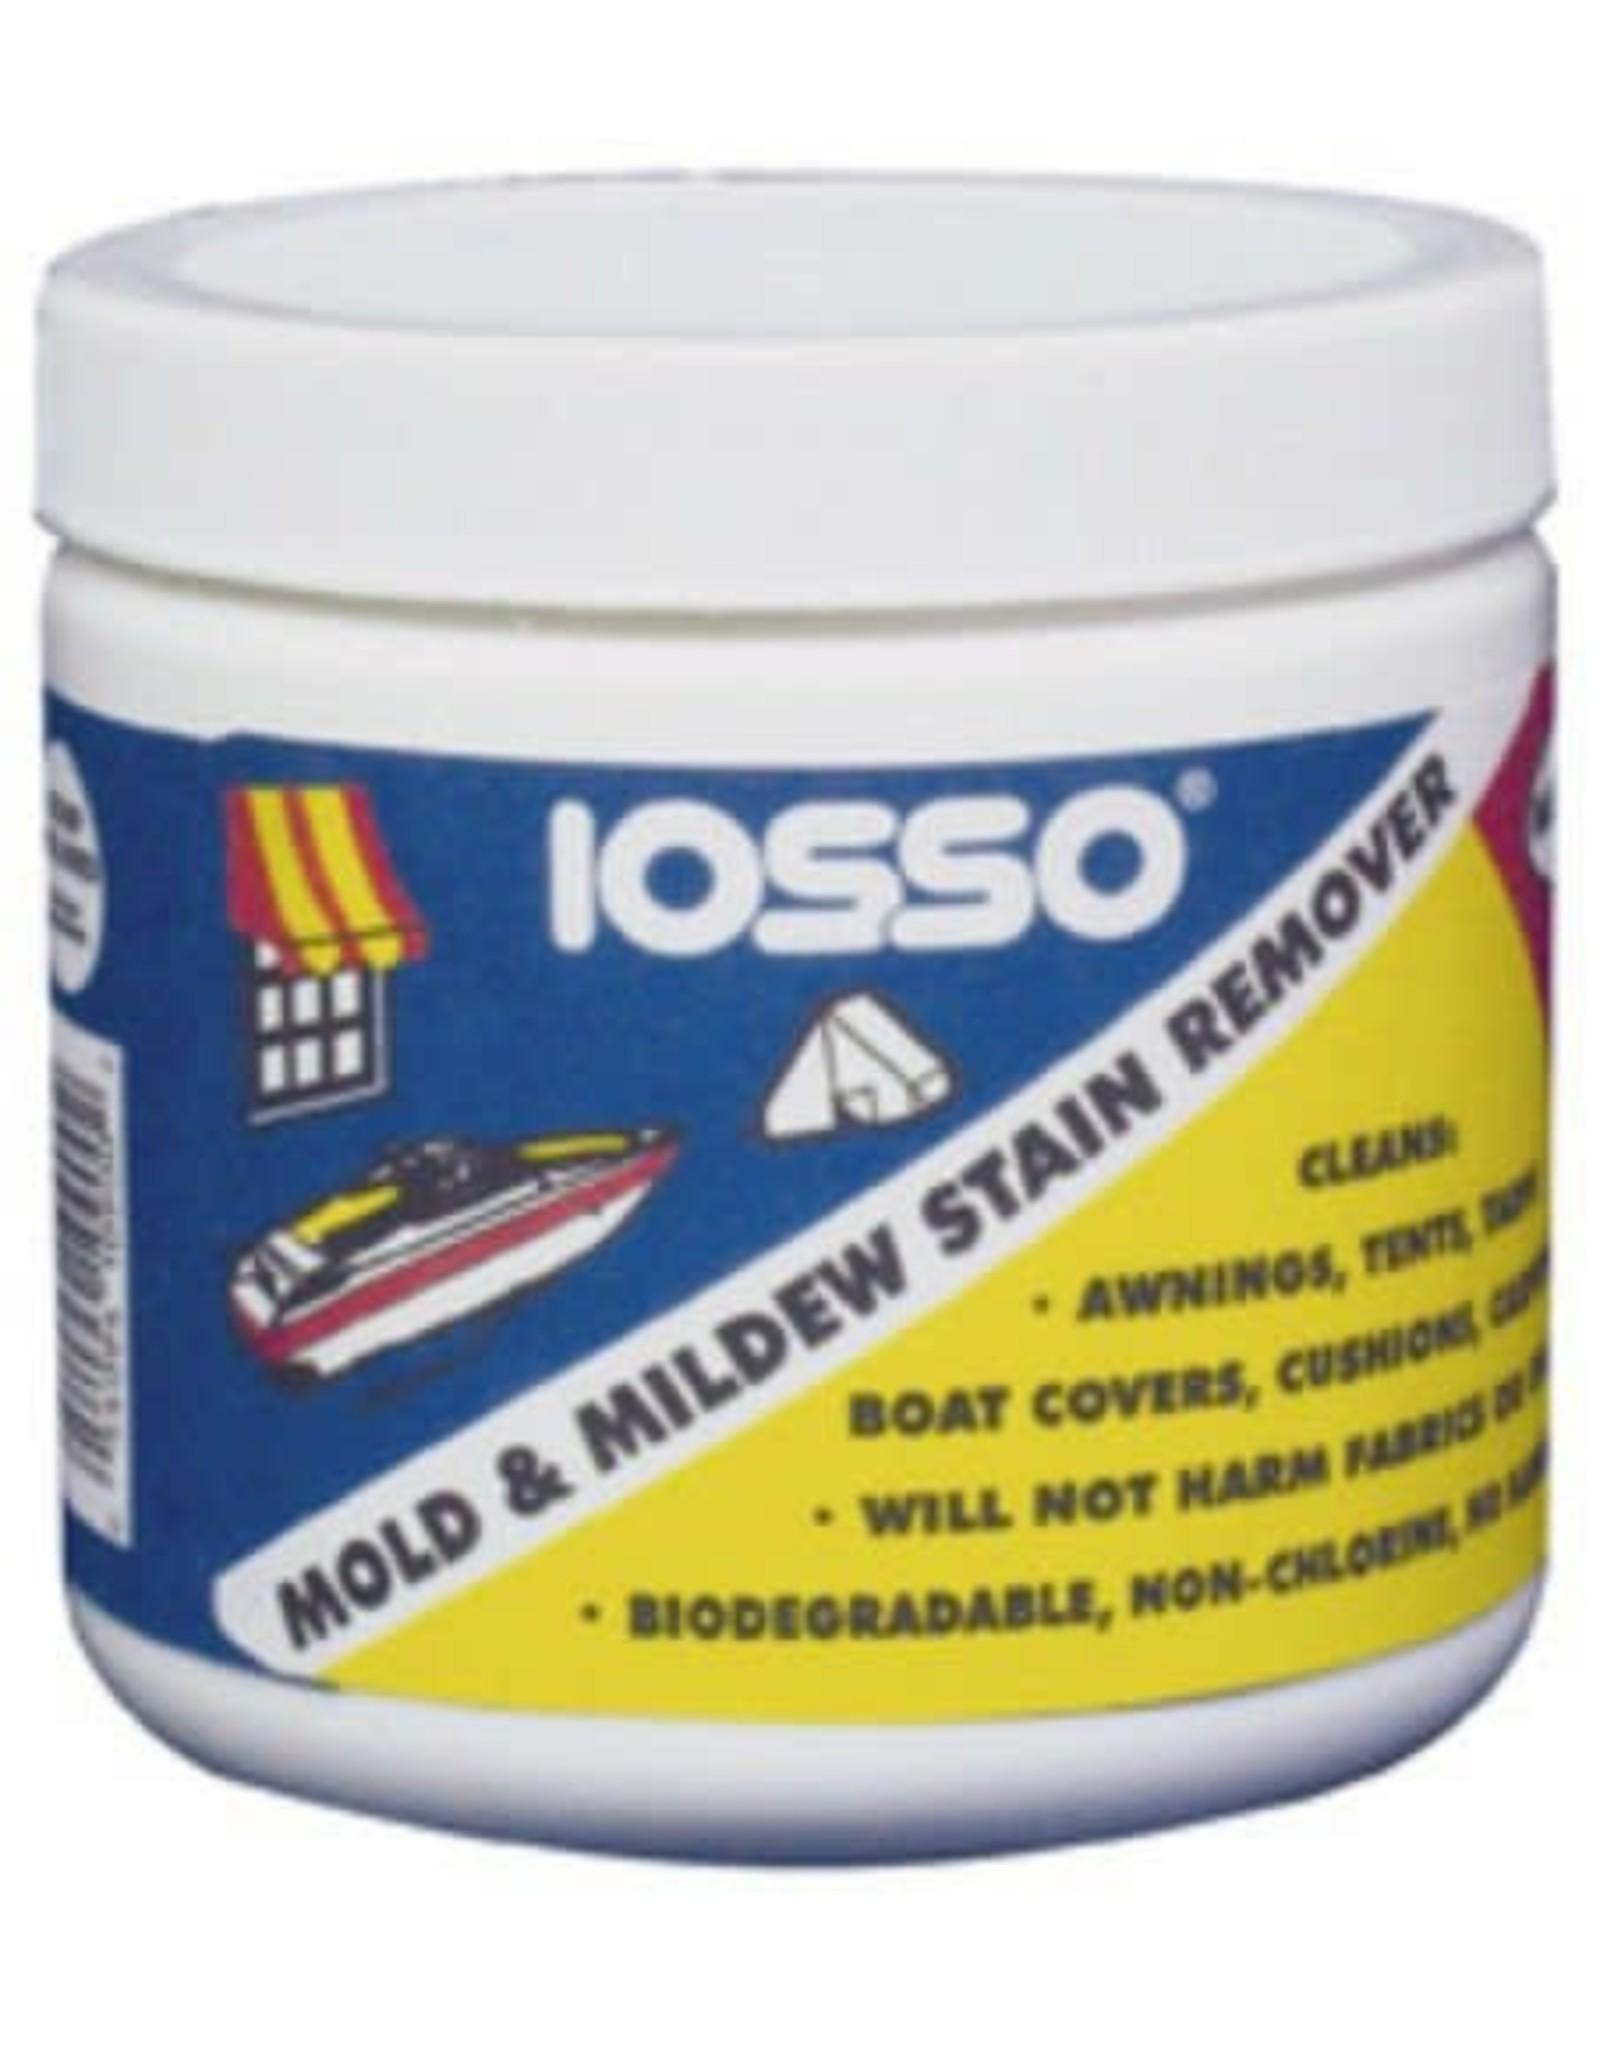 Iosso Iosso Mold mildew stain remover